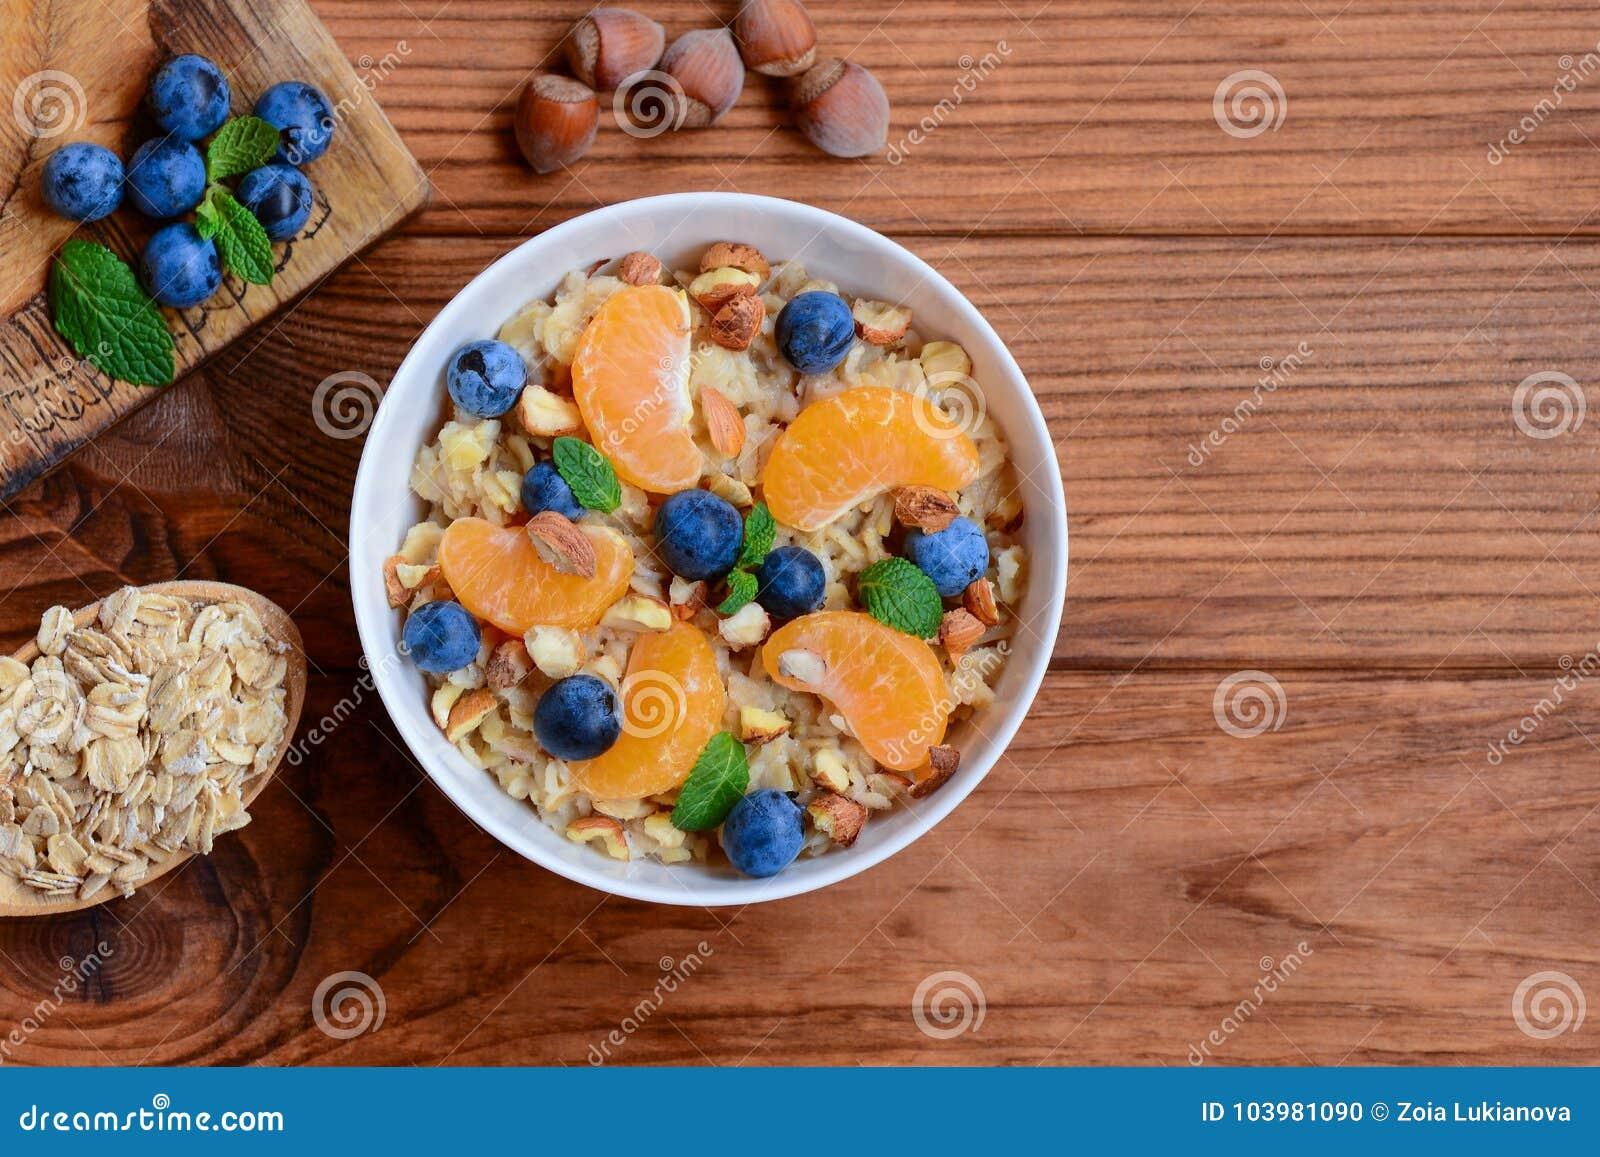 Oats Porridge Without Sugar. Porridge With Fresh Tangerines ...